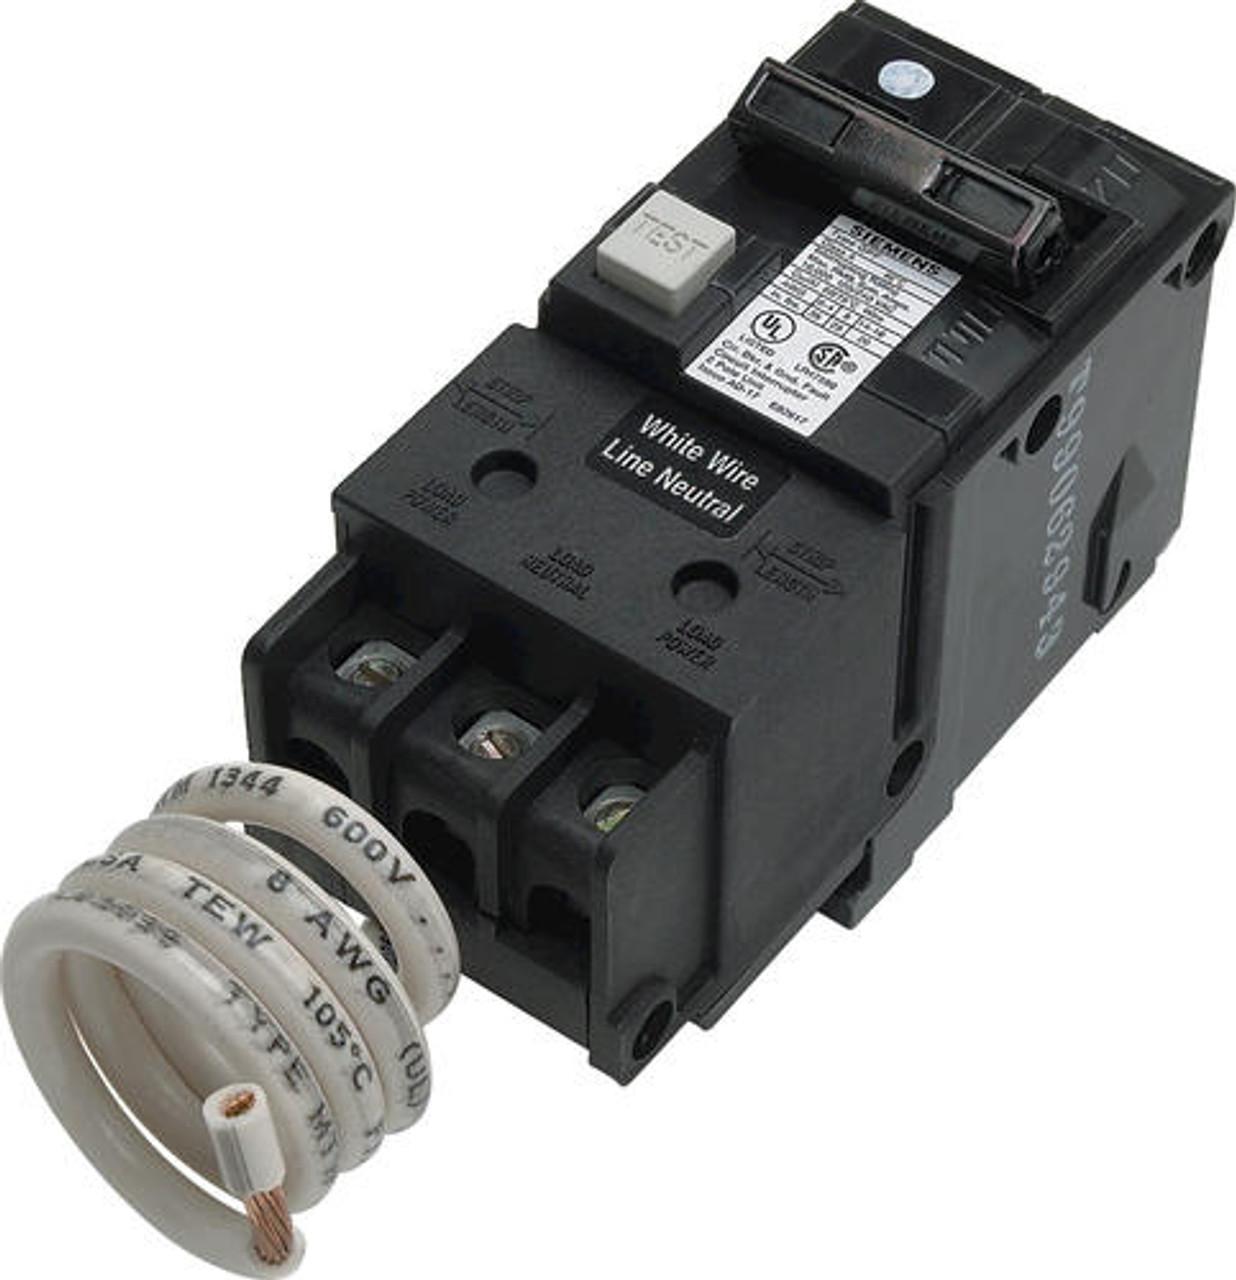 medium resolution of siemens 40 amp gfci double pole breaker in canada siemens gfci breaker wiring